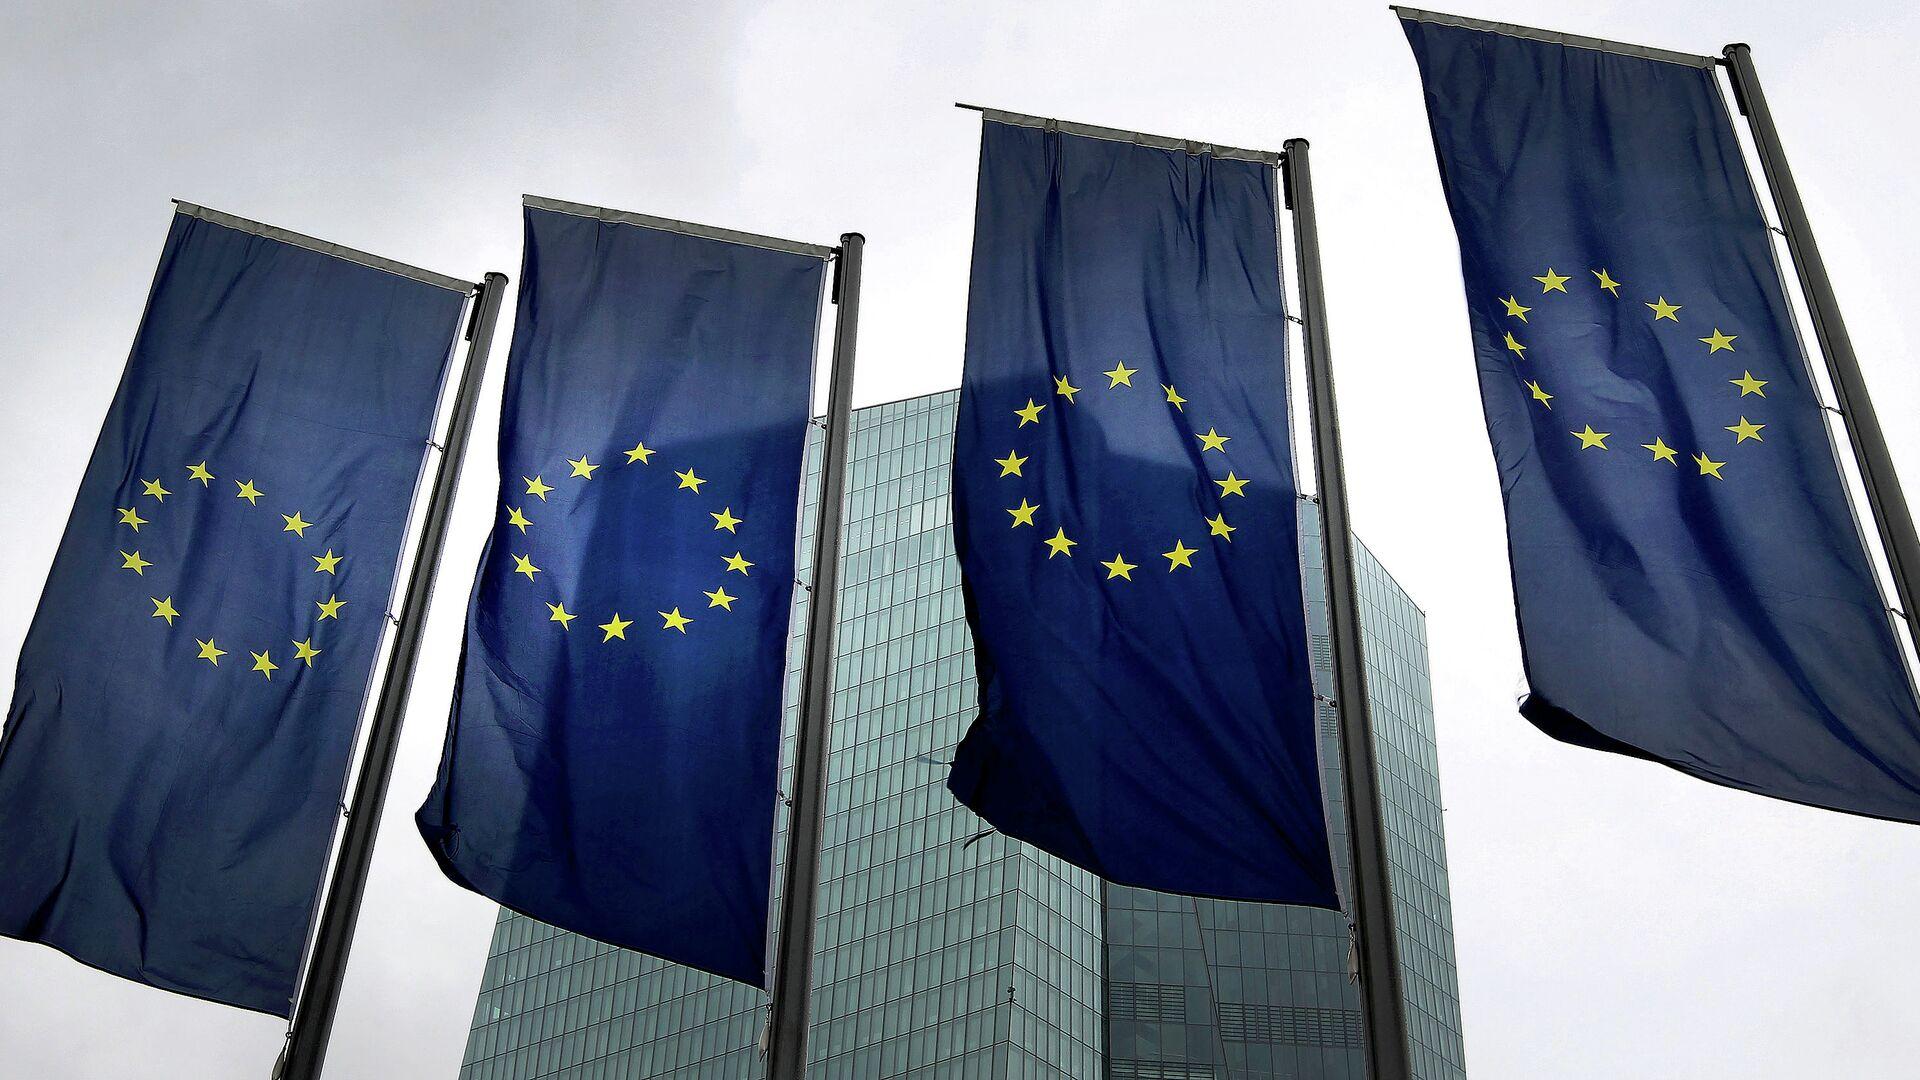 Banderas de la Unión Europea - Sputnik Mundo, 1920, 29.04.2021